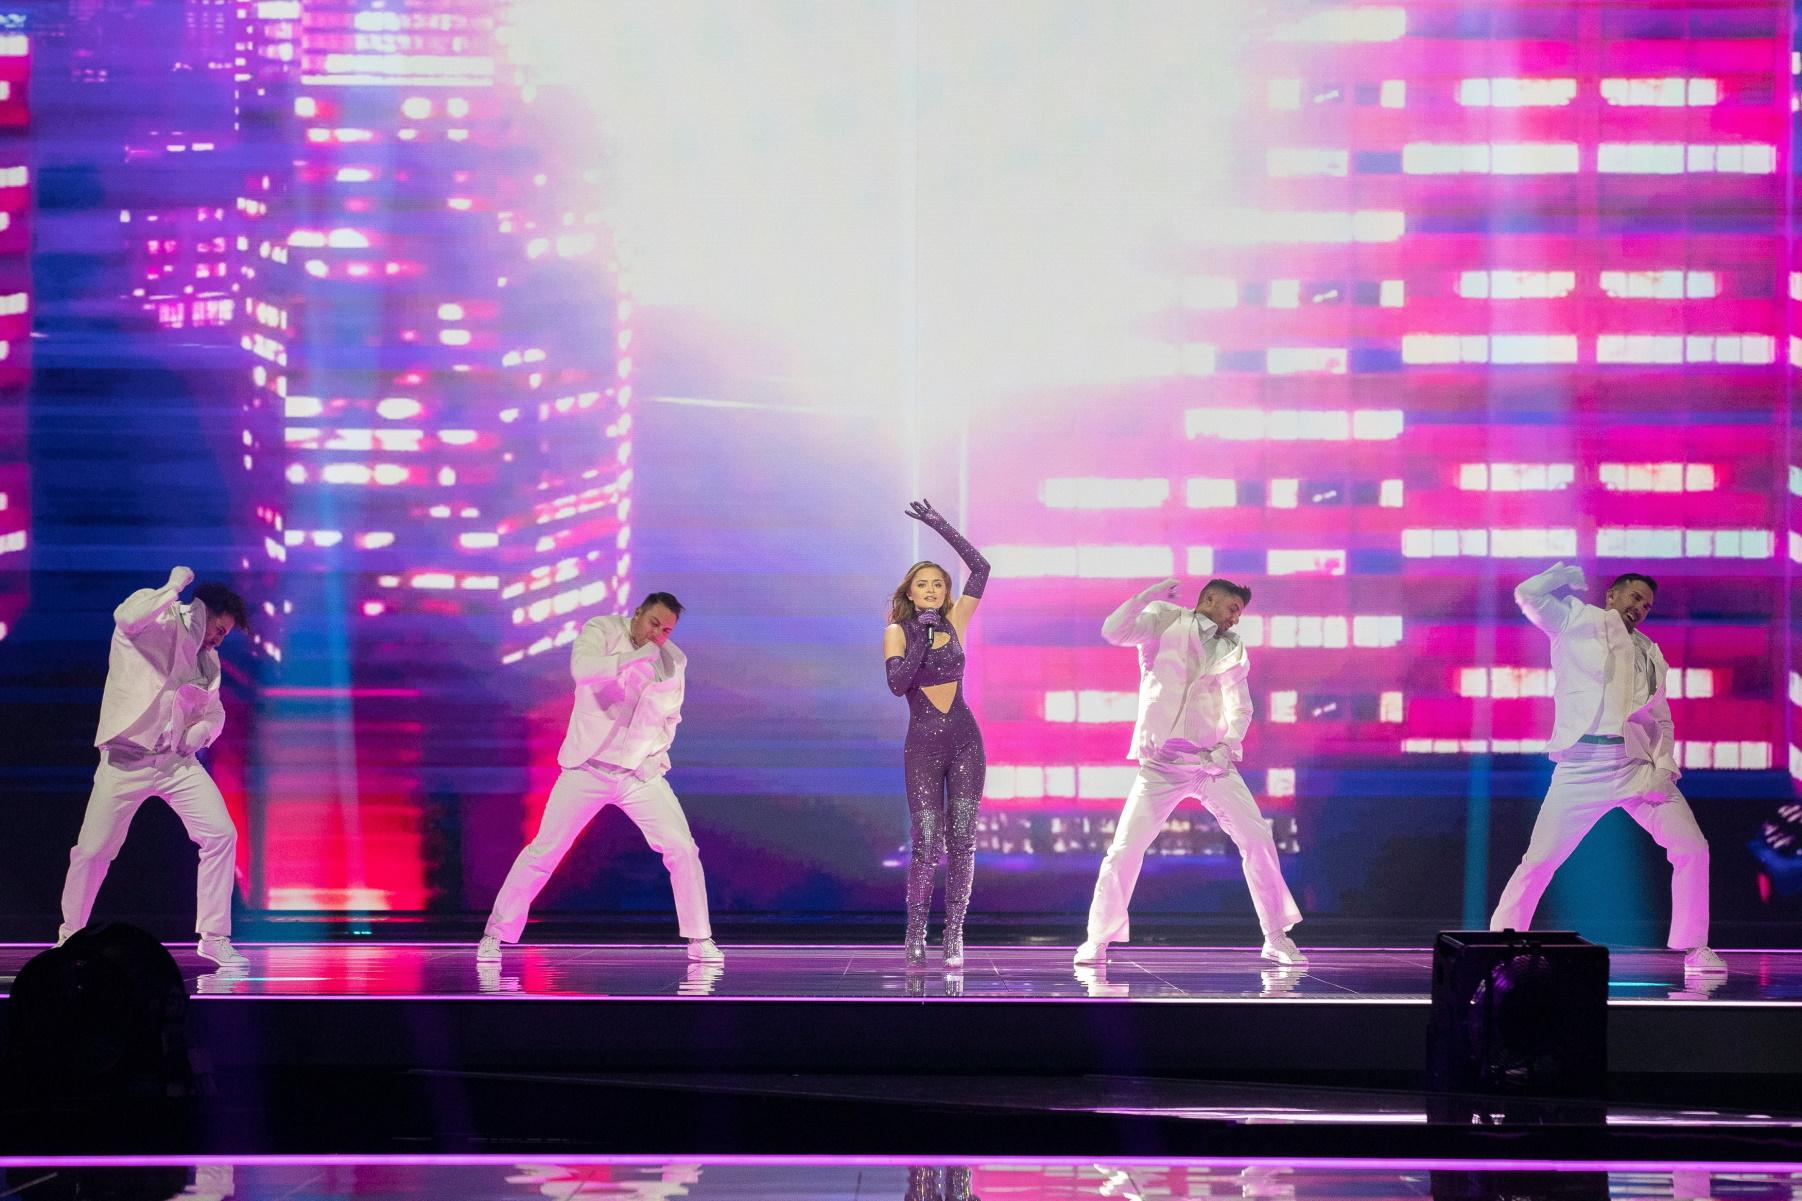 Eurovision 2021 – Stefania: Το μυστικό της εμφάνισης και τα 250.000 κρύσταλλα Swarovski